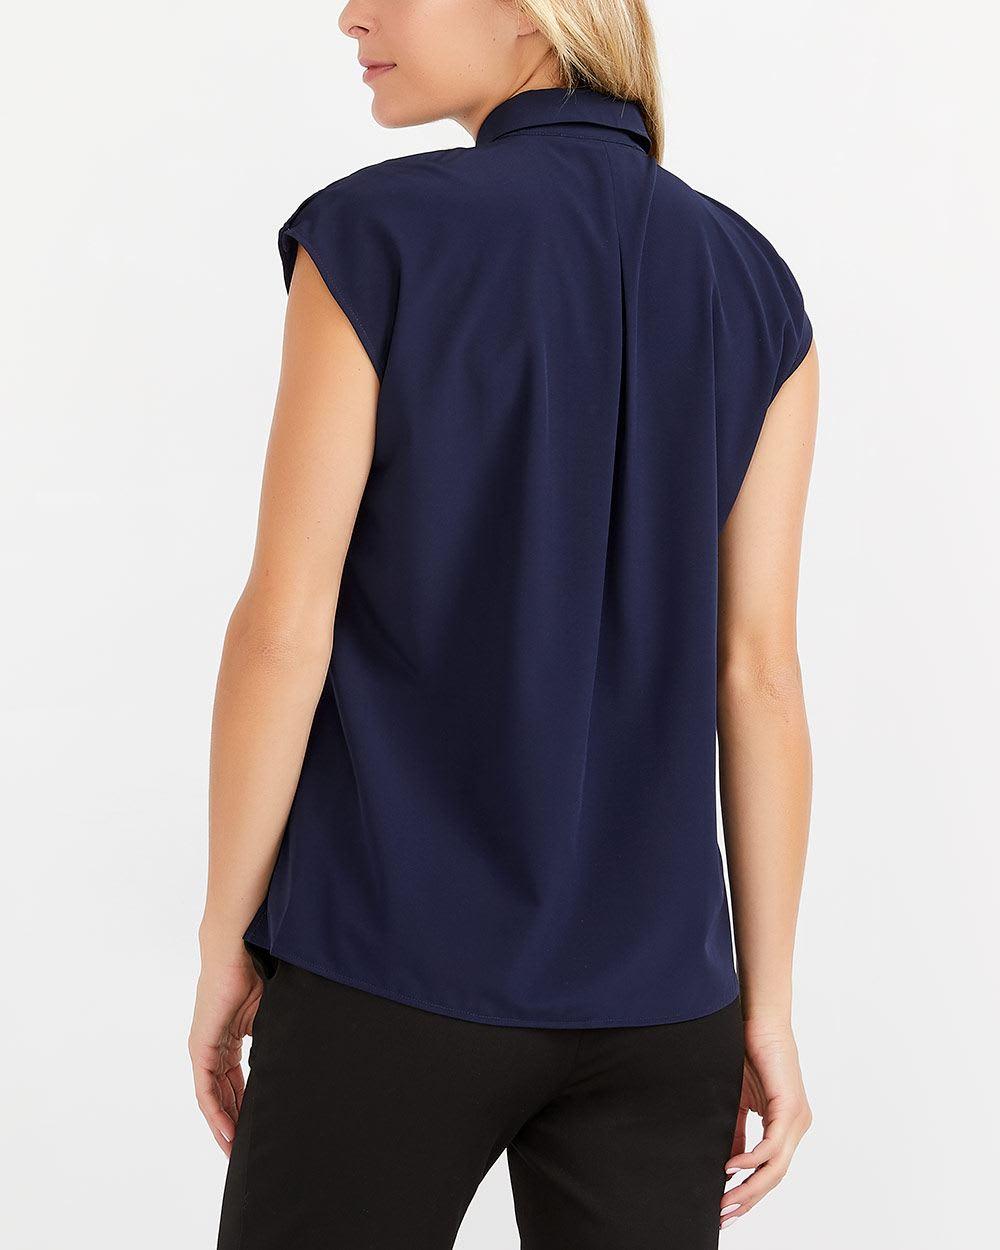 Willow & Thread Cap Sleeve Shirt